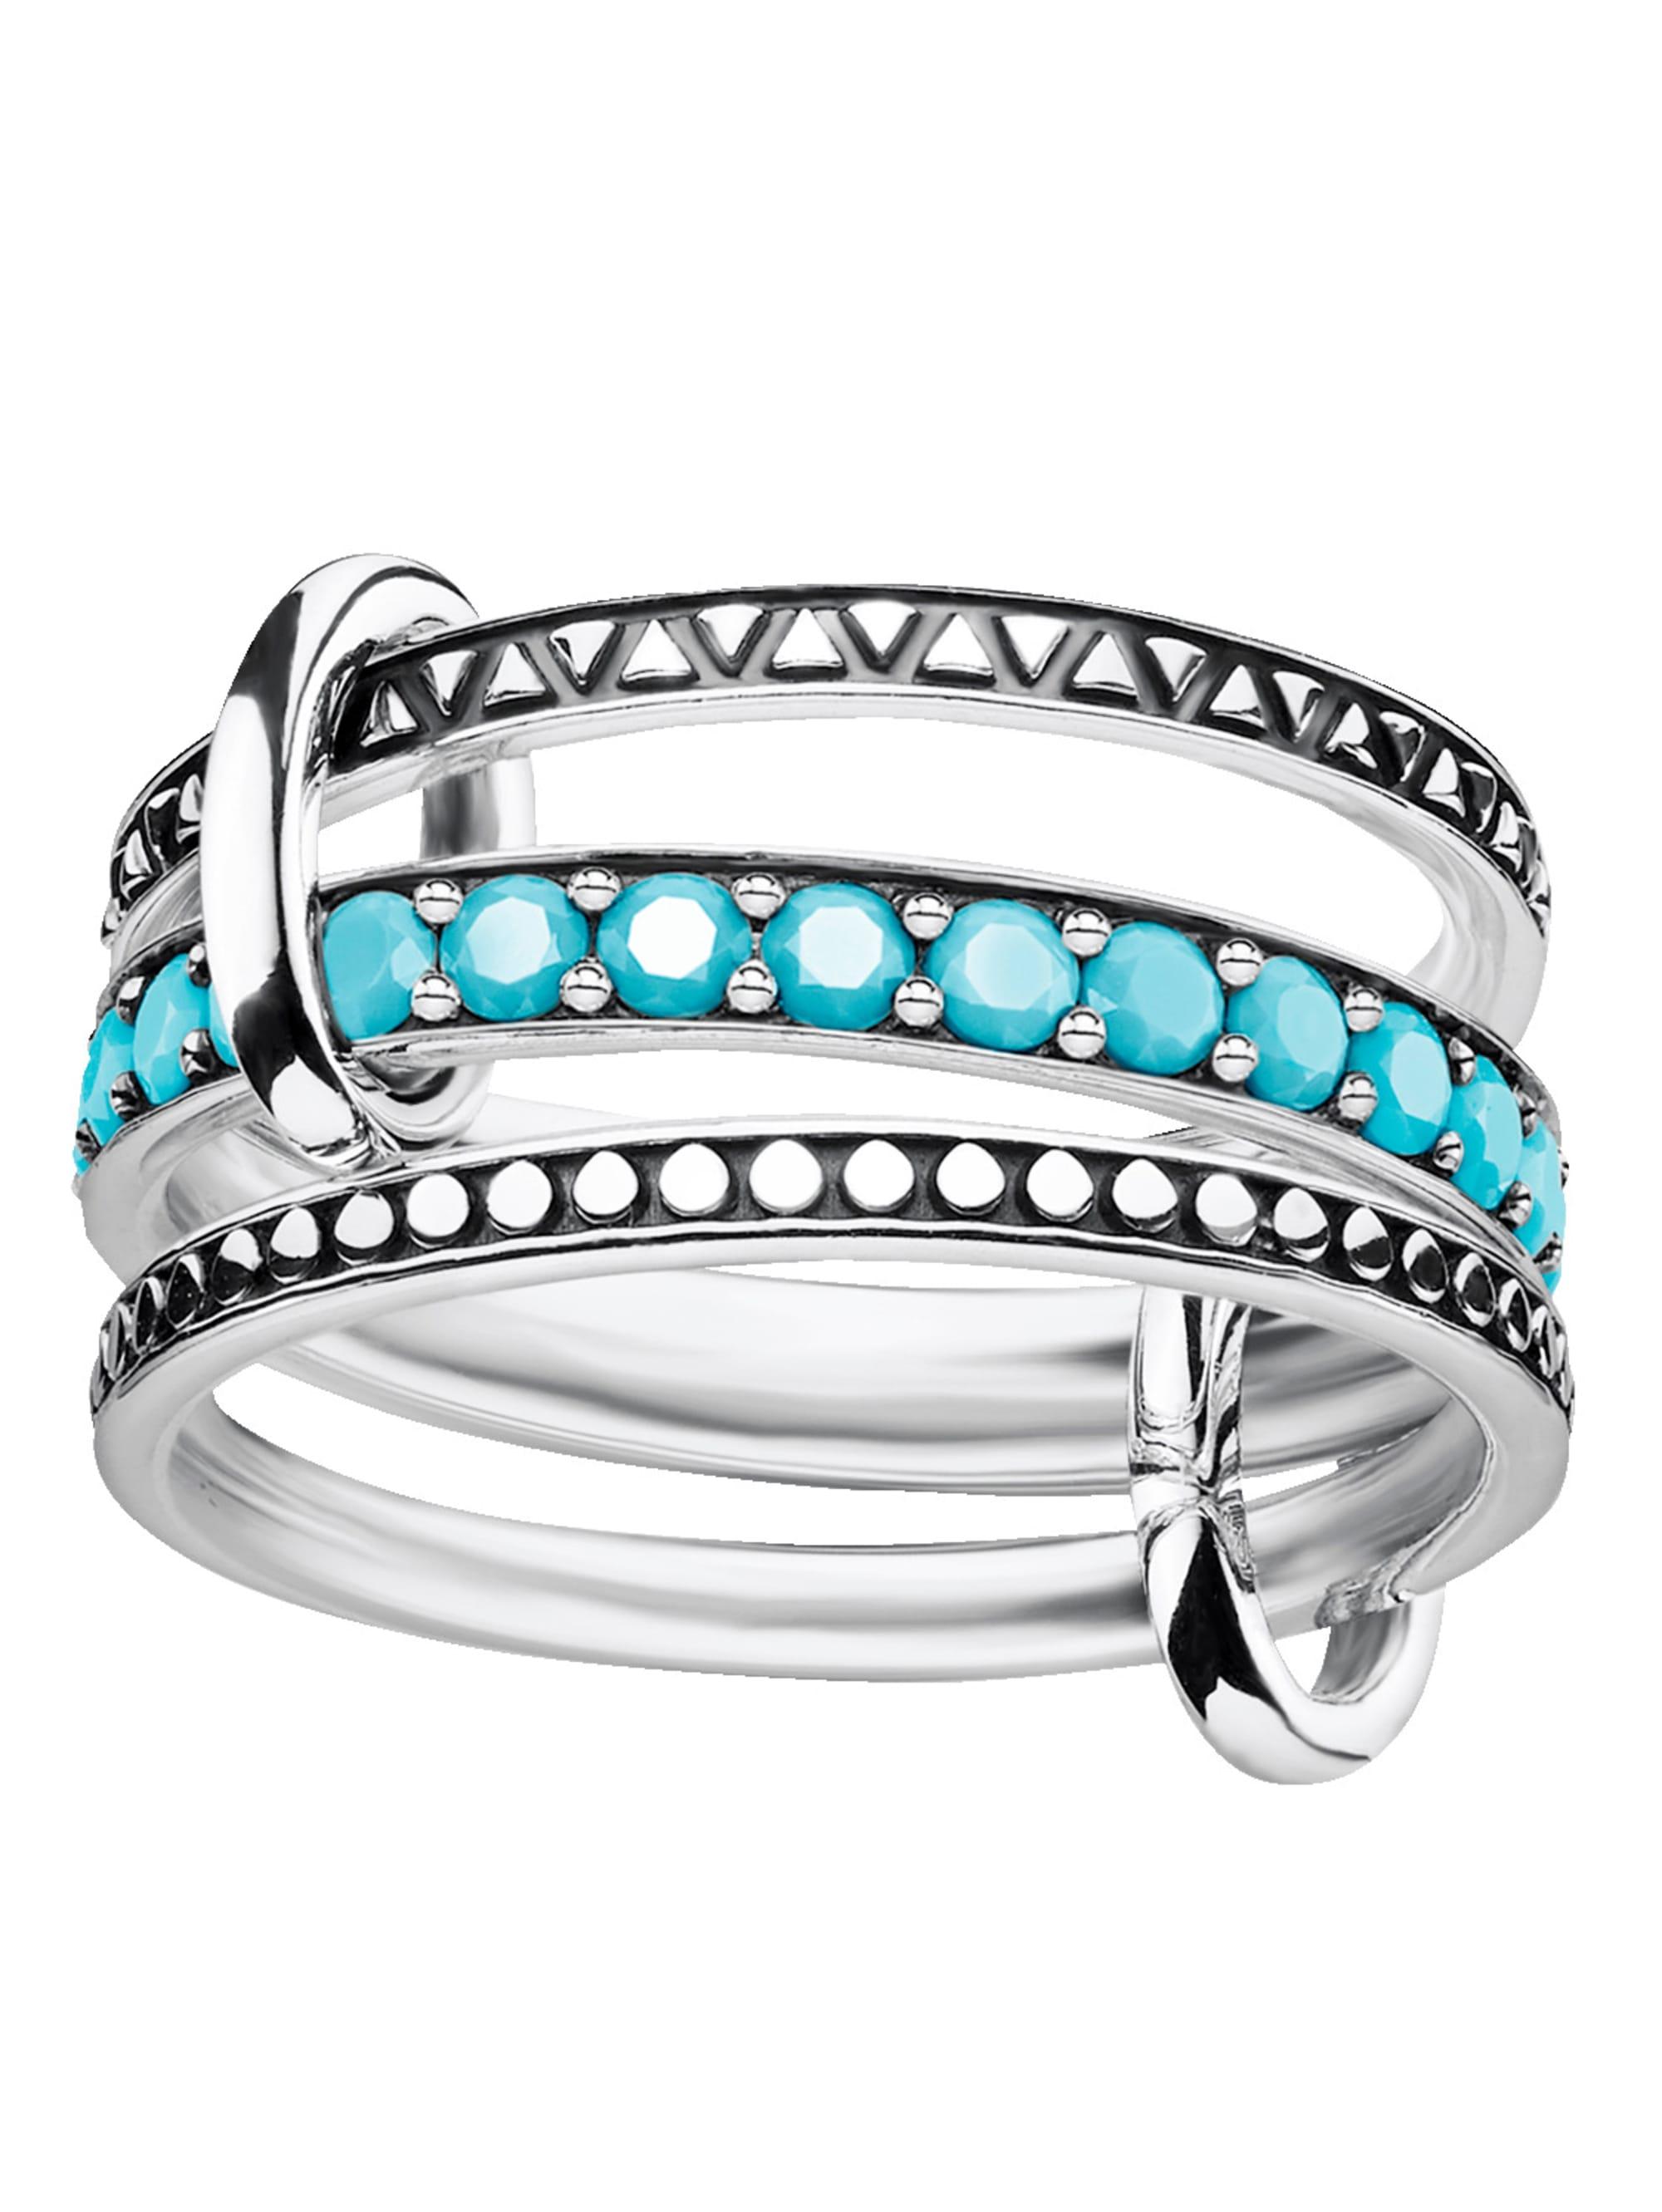 Thomas Sabo Triple Ring in Silber 925 TRIPLE RING TR2195-667-17 Z6Ii0